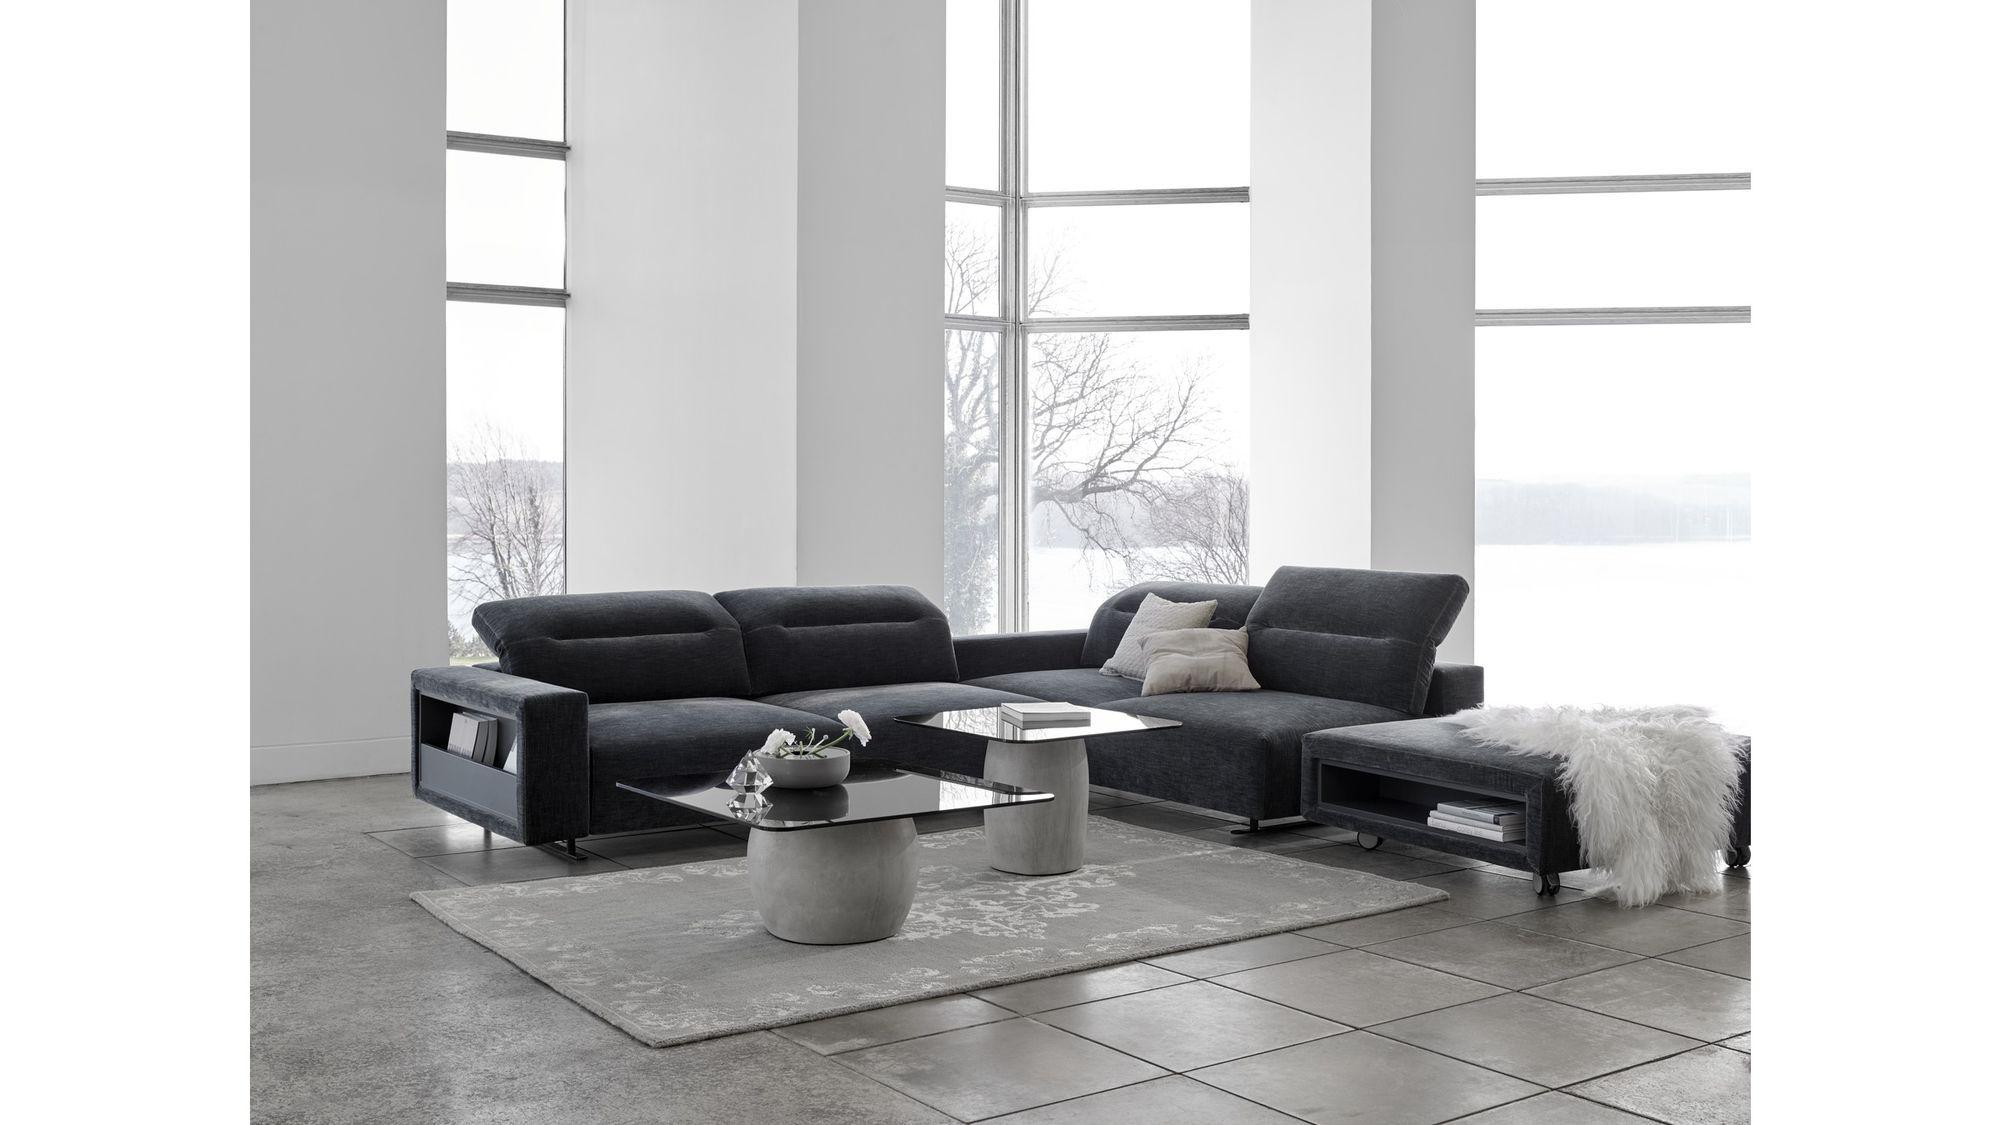 Sofa Designs Sofa Sectionals Inspiration BoConcept